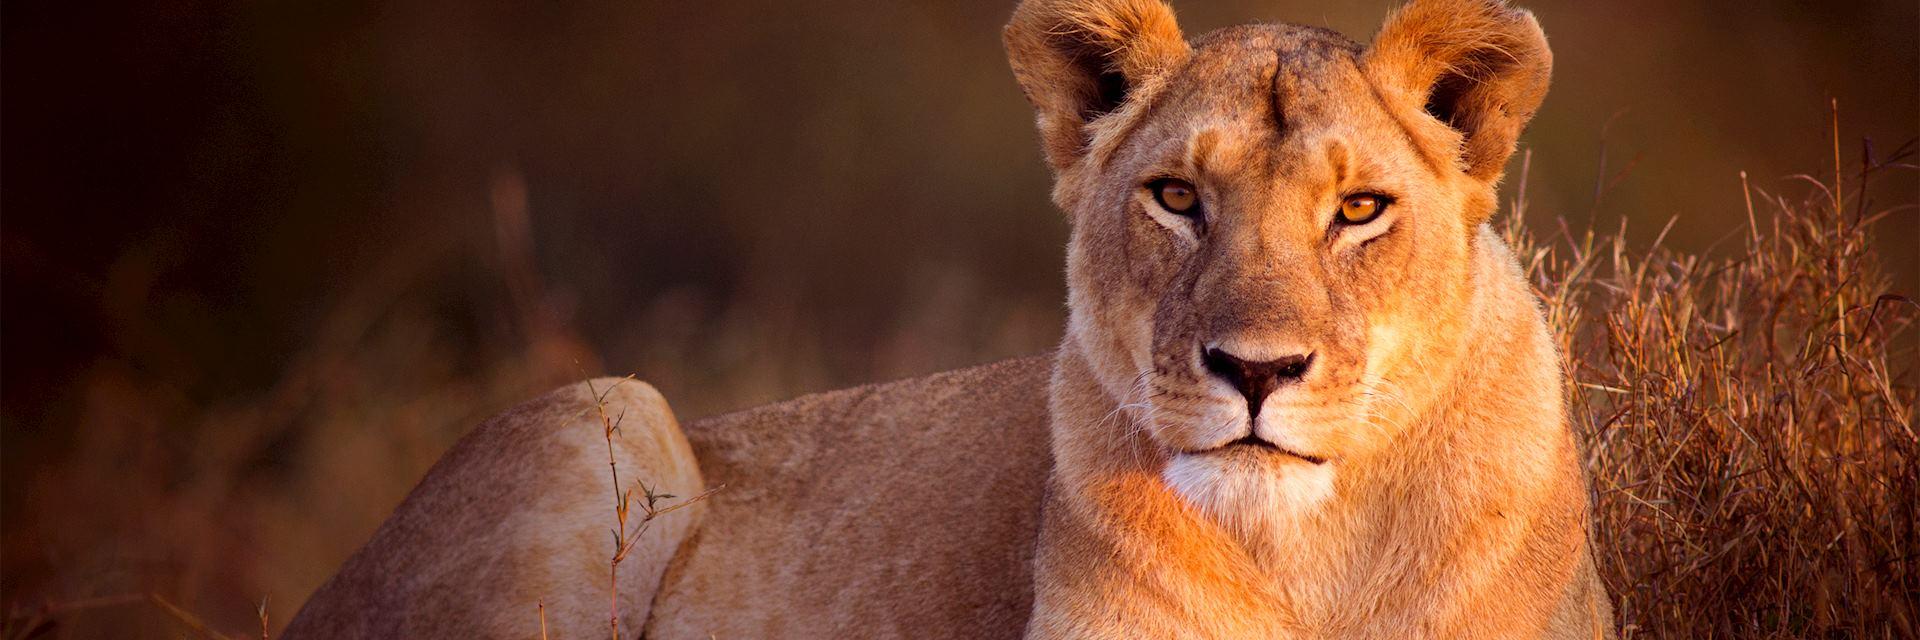 Lioness in the Masai Mara, Kenya